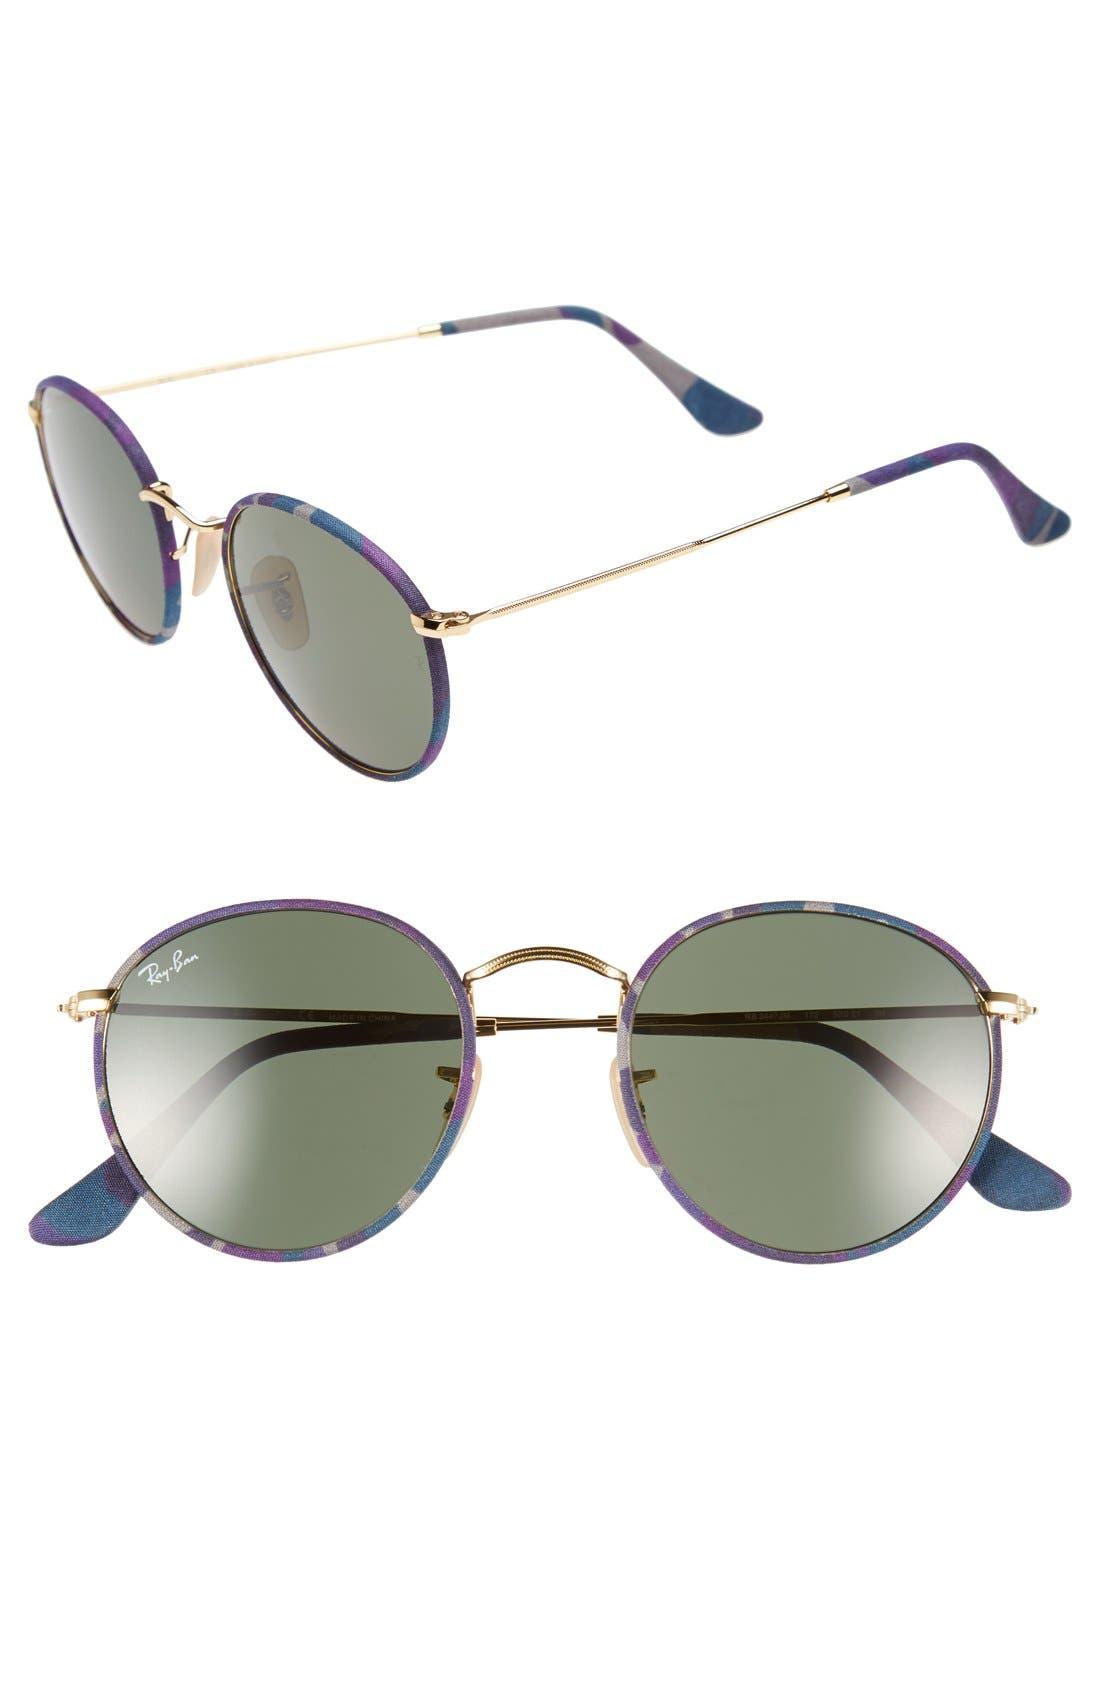 Main Image - Ray-Ban Icons 50mm Camo Print Round Sunglasses